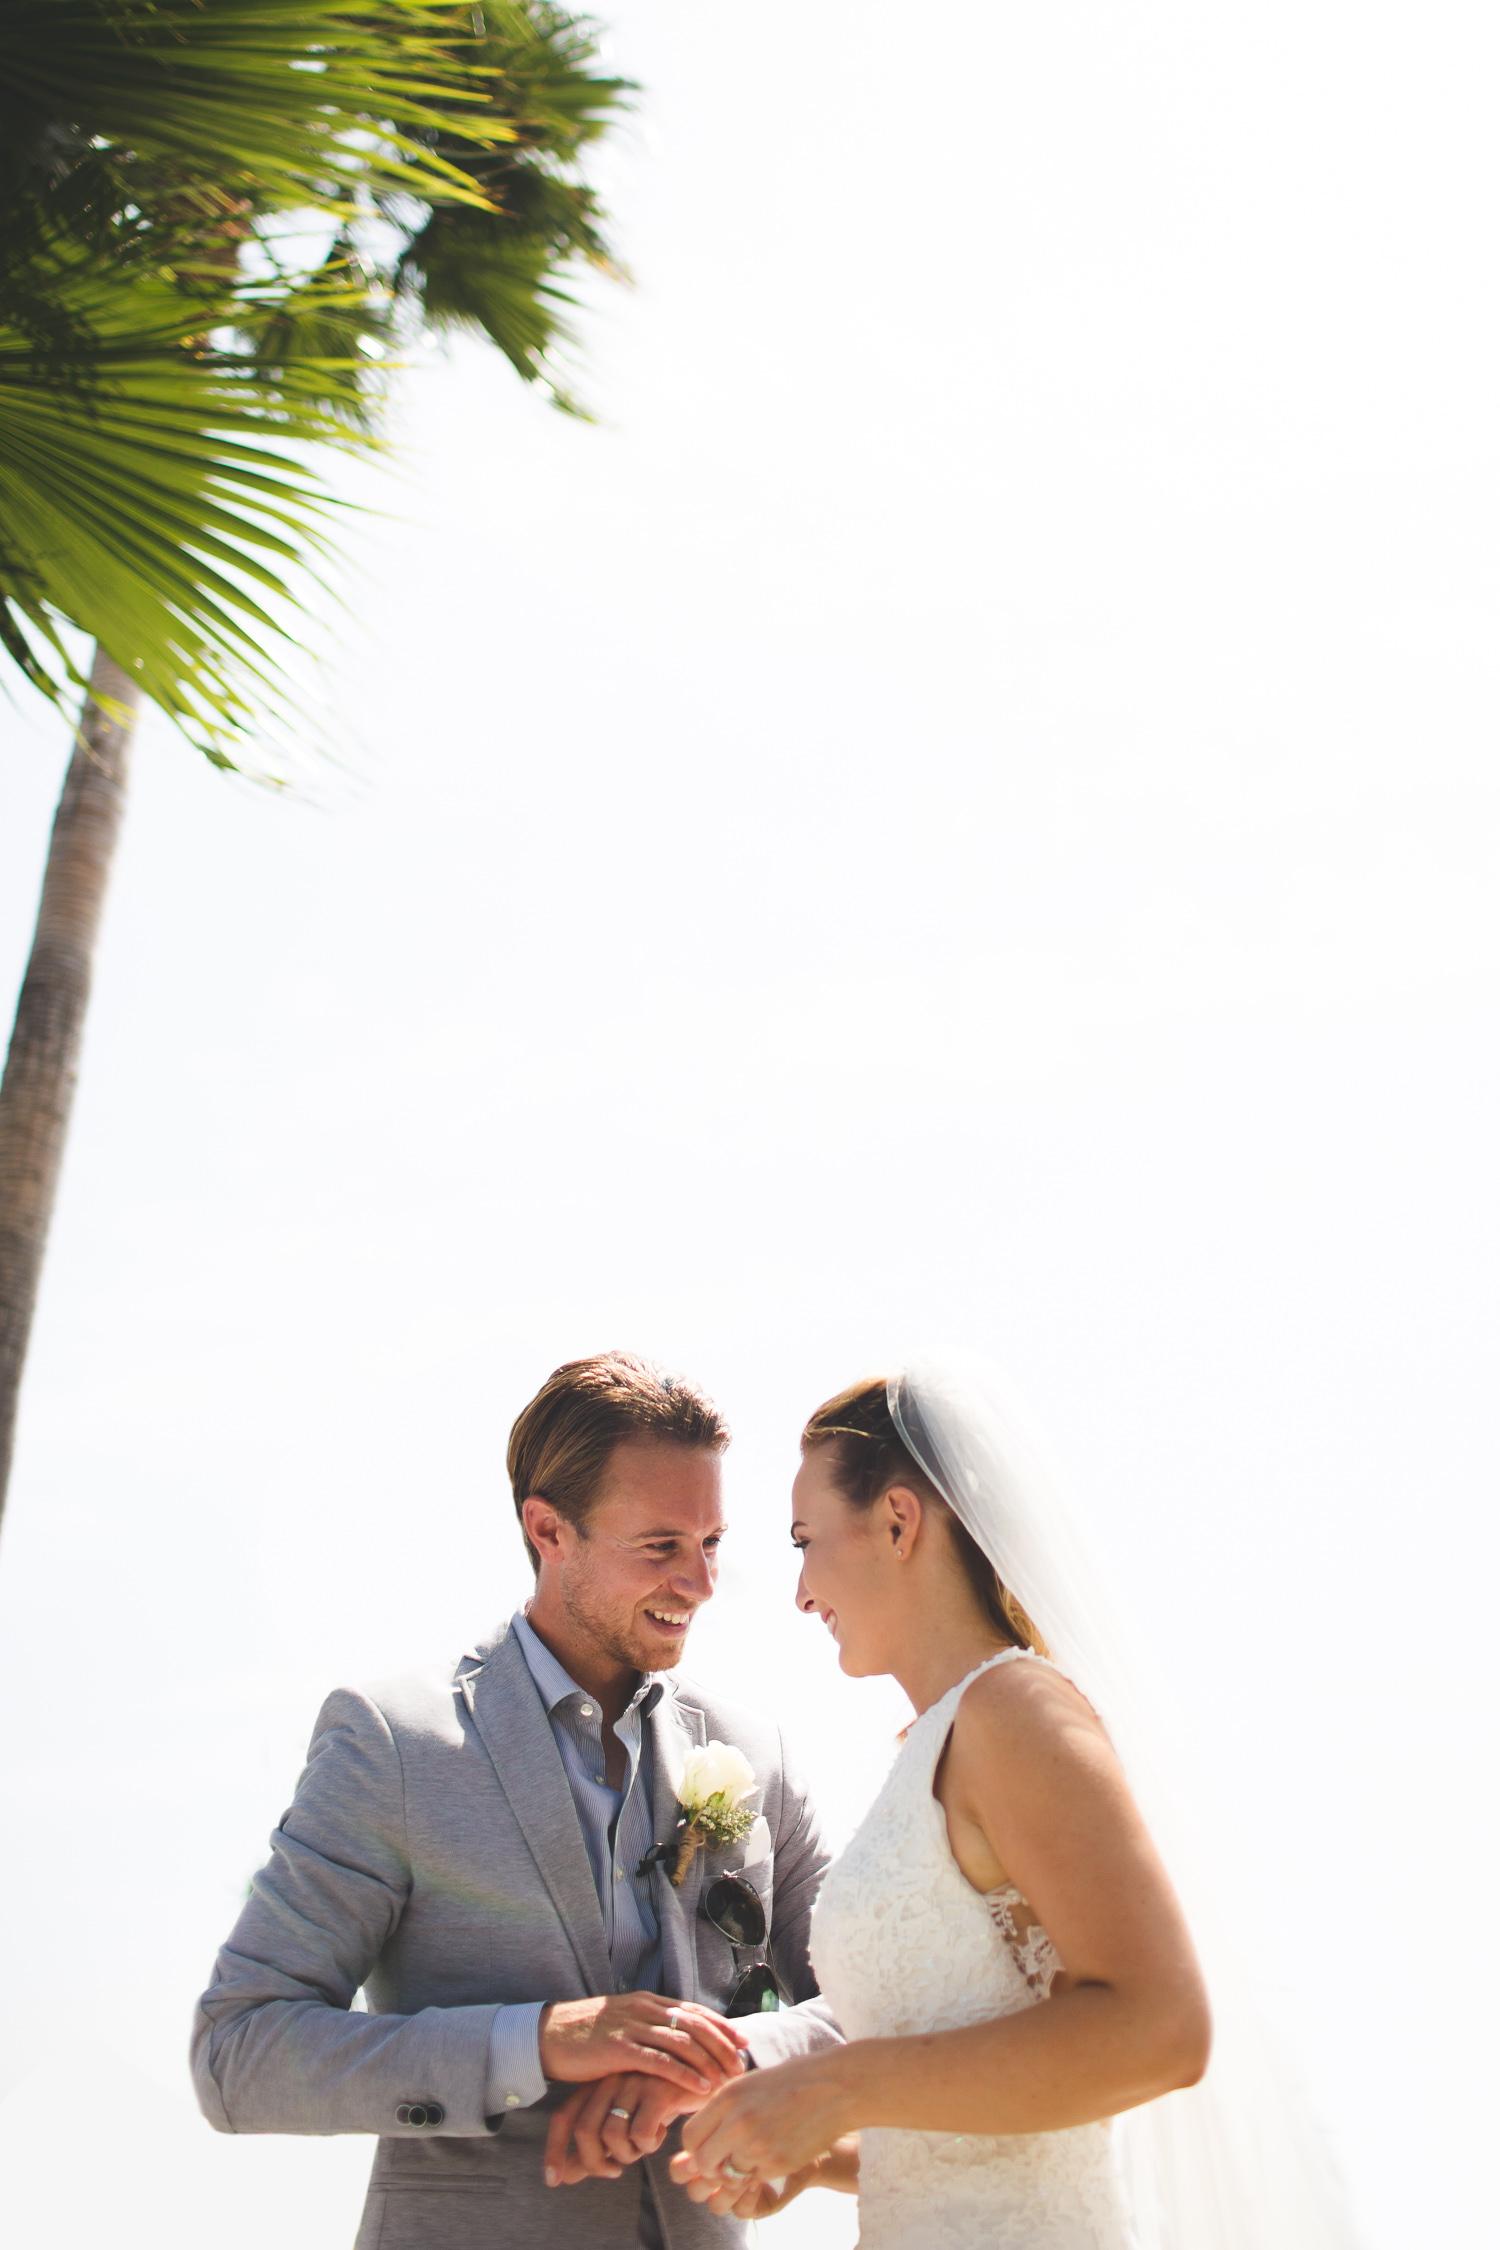 Surrey Wedding Photographer Kit Myers Paige Craig Spain066.jpg